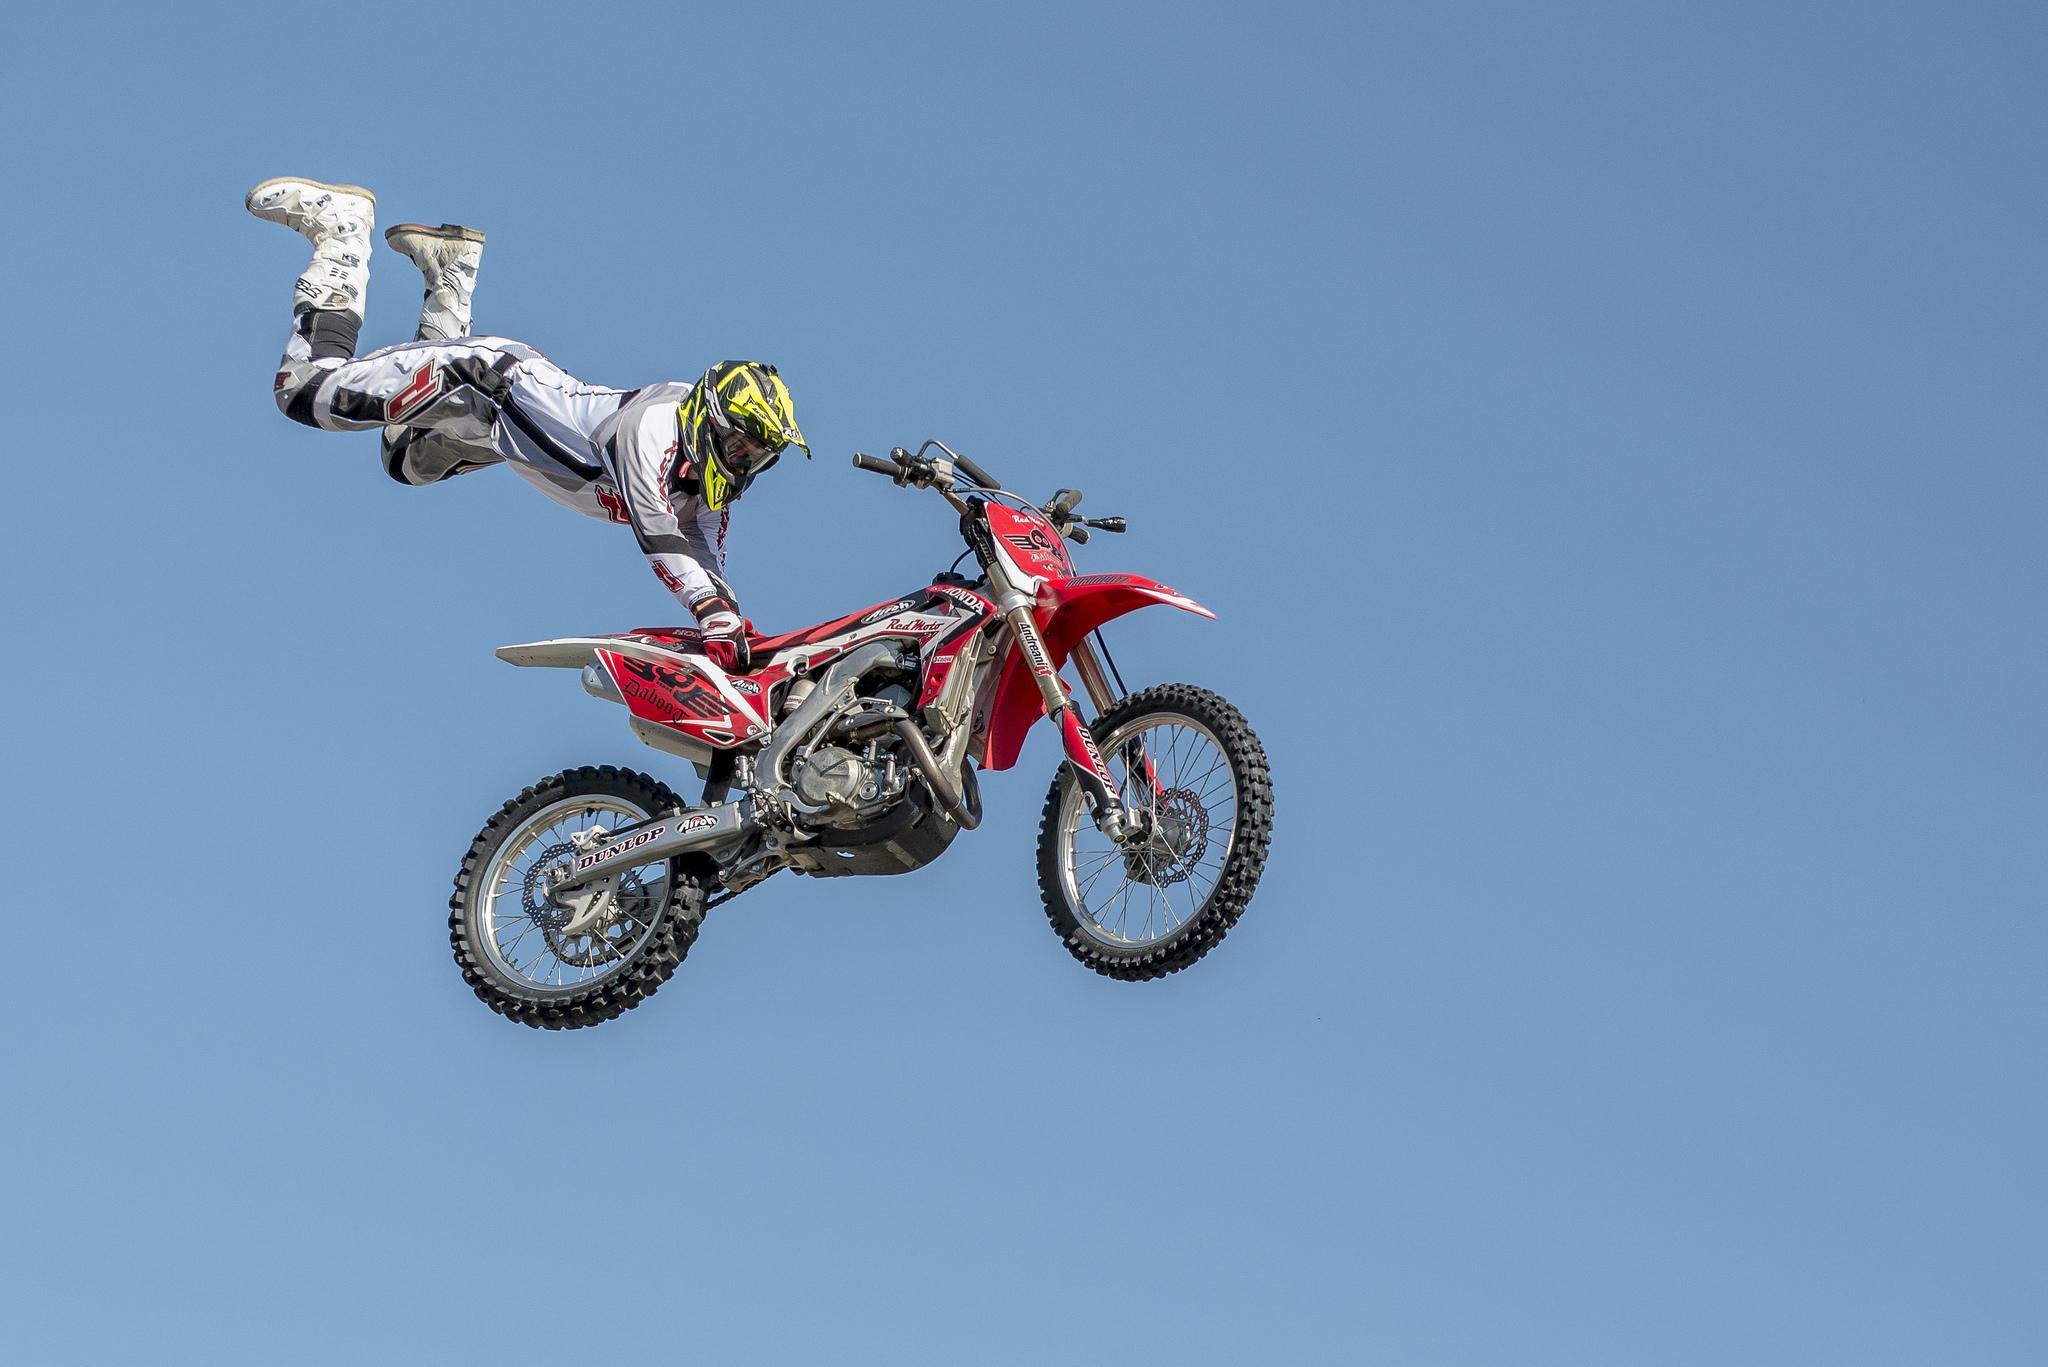 обои трюк, мотокросс, мотоцикл картинки фото